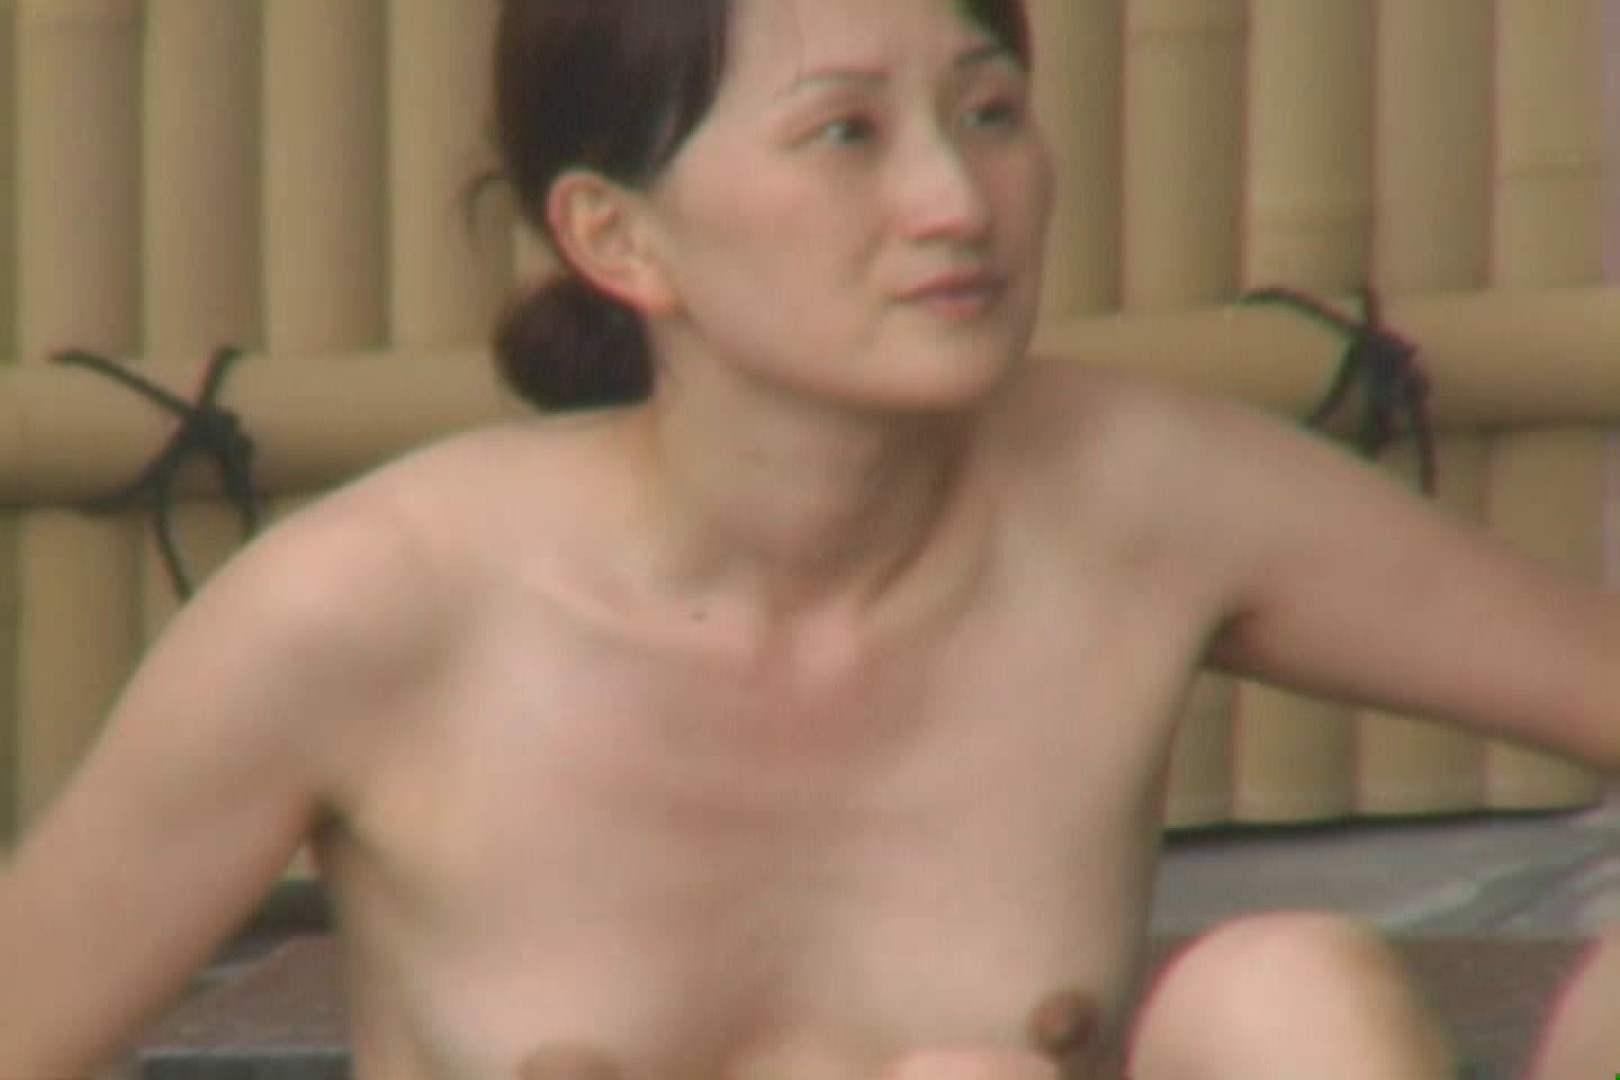 Aquaな露天風呂Vol.578 露天風呂突入 のぞき動画画像 70pic 53